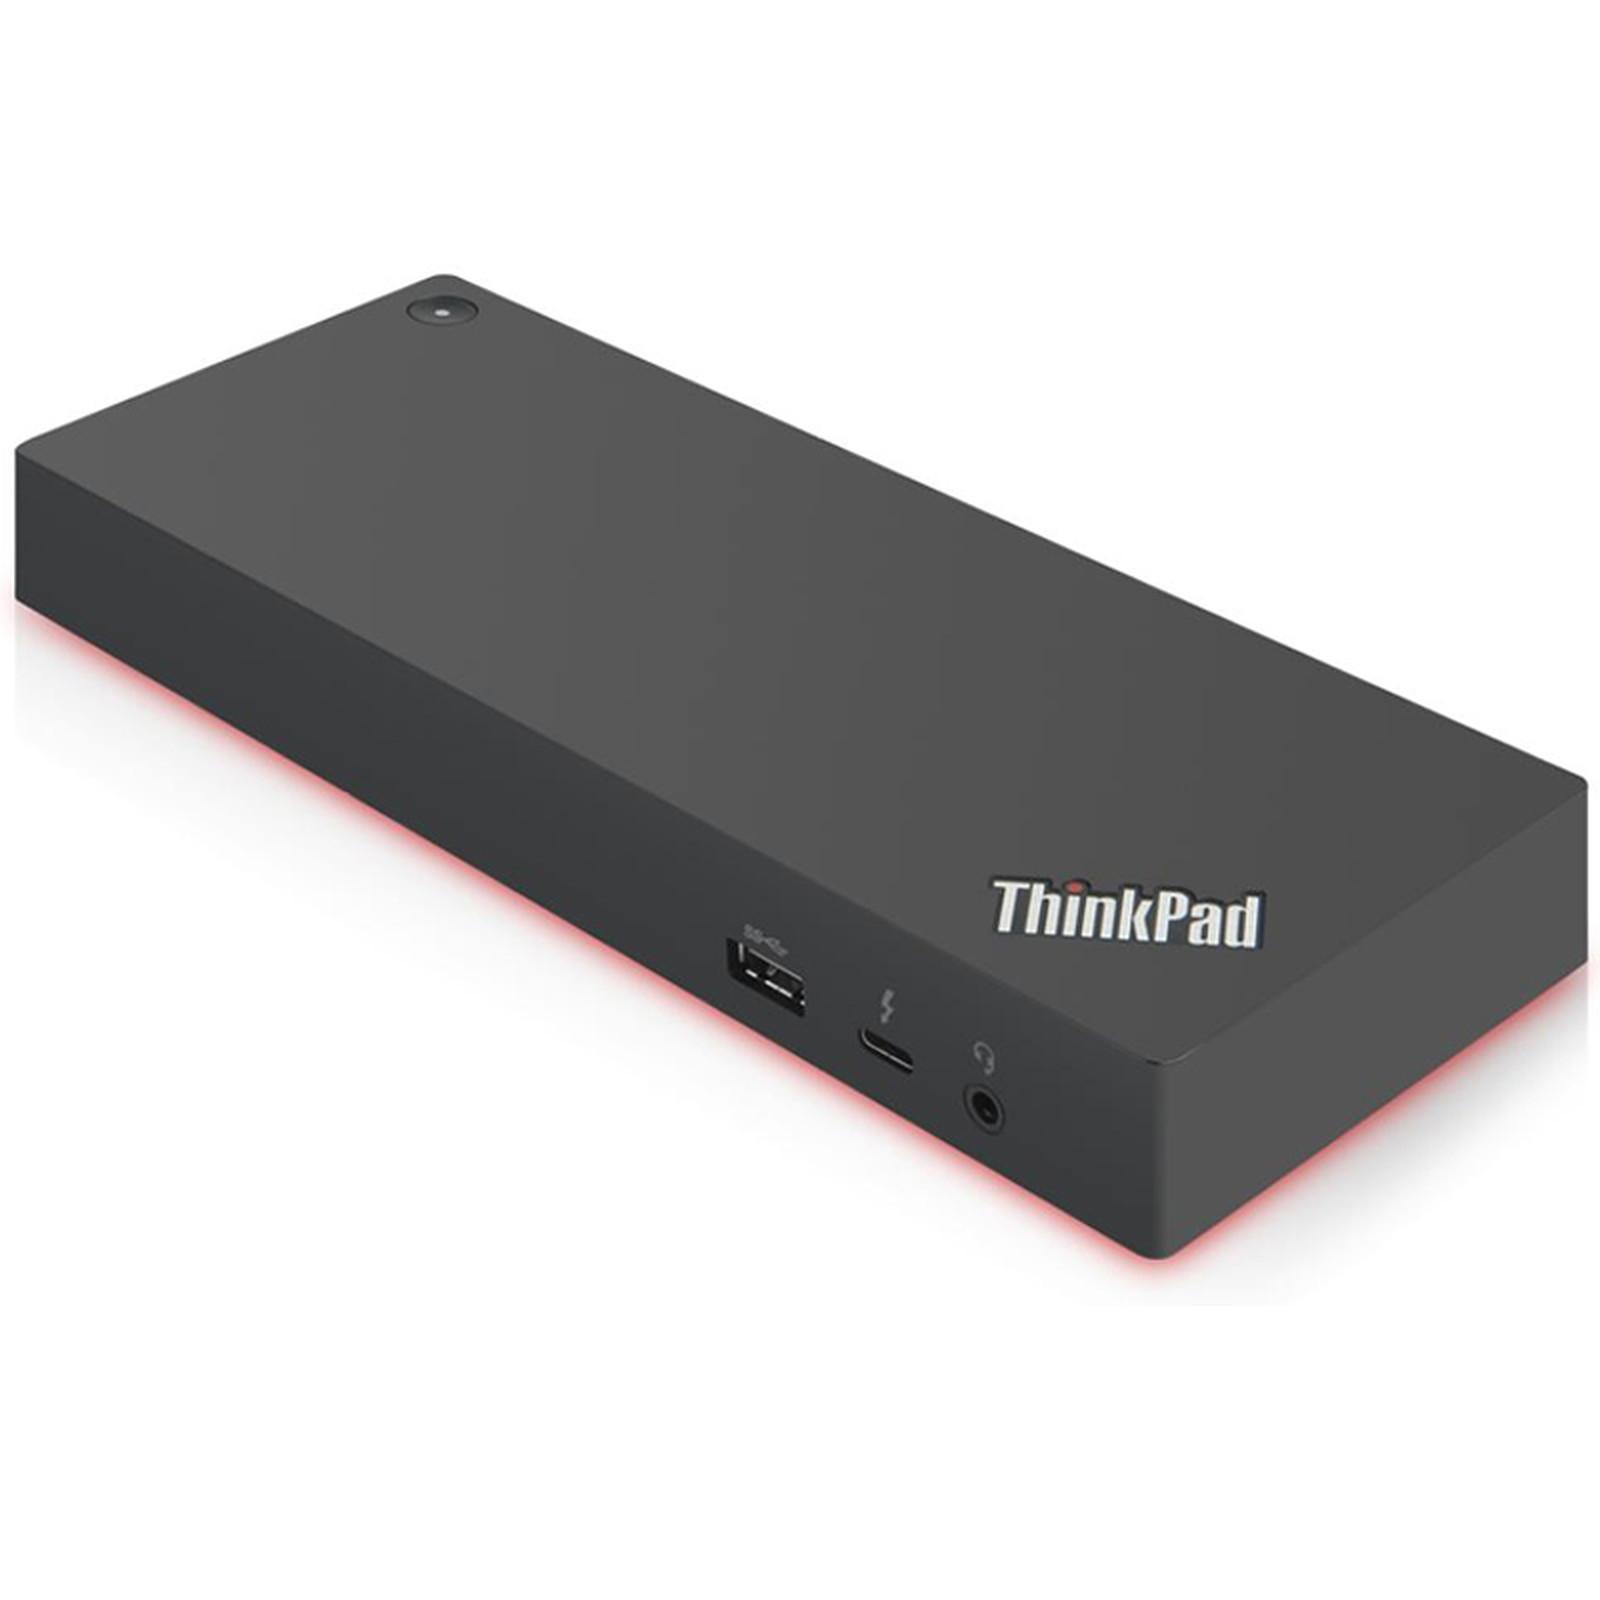 Lenovo ThinkPad Thunderbolt 3 Workstation Dock 170 W